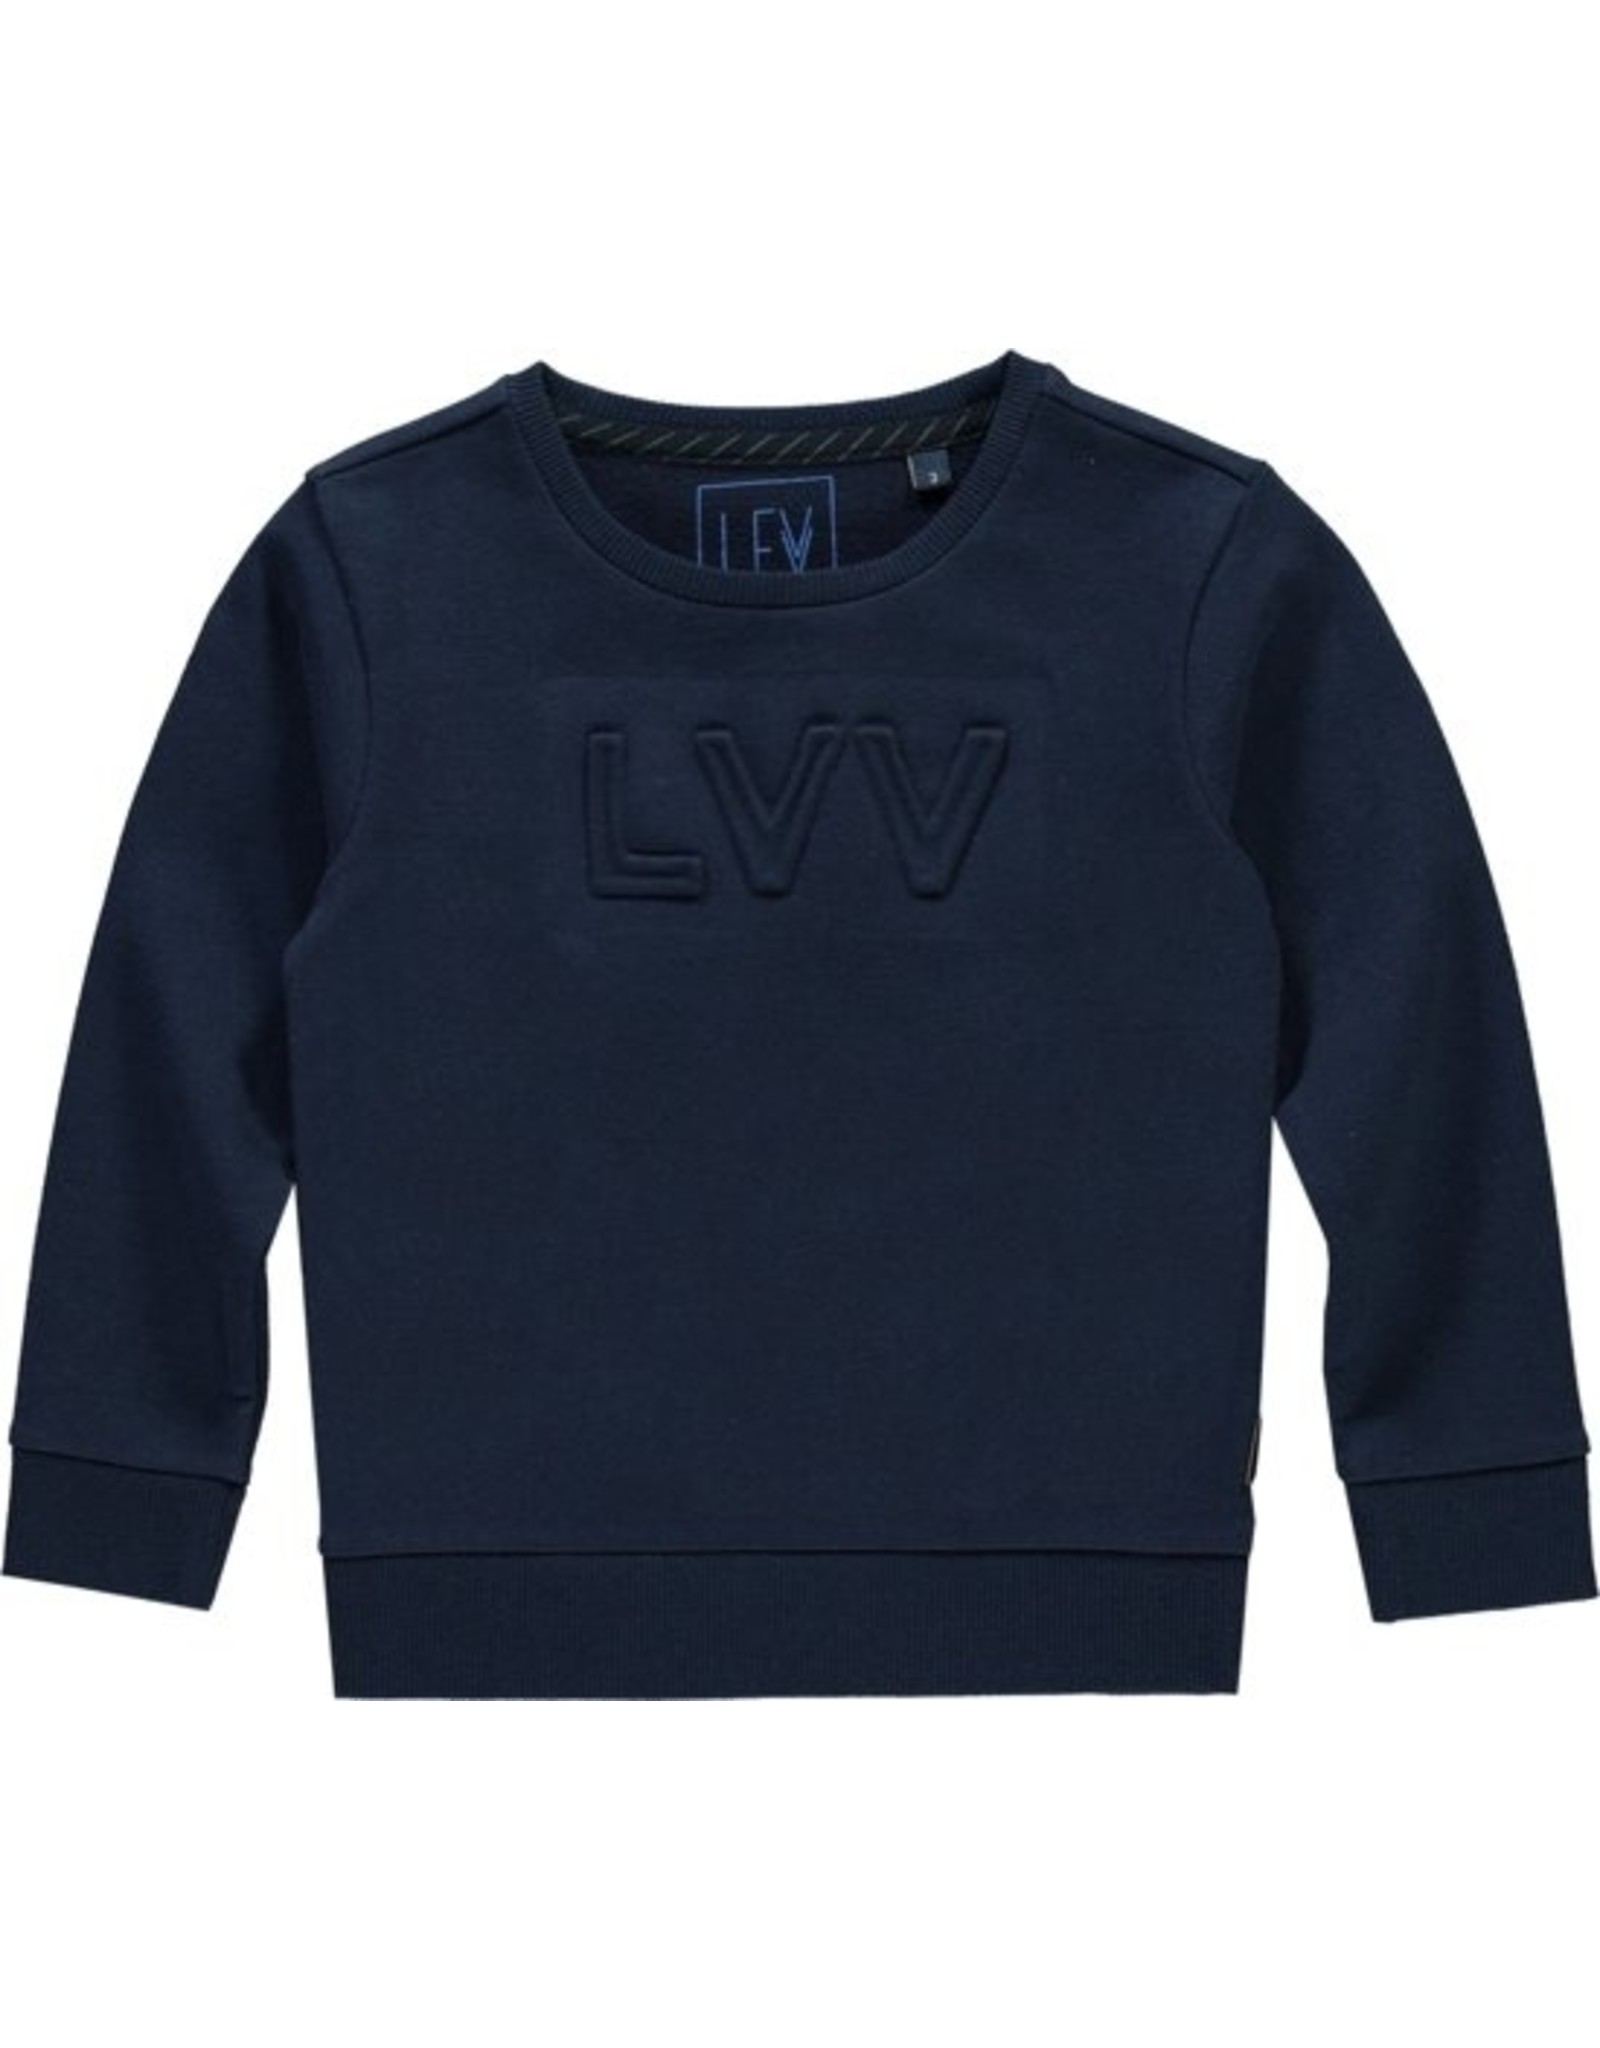 Levv ELVIN 2